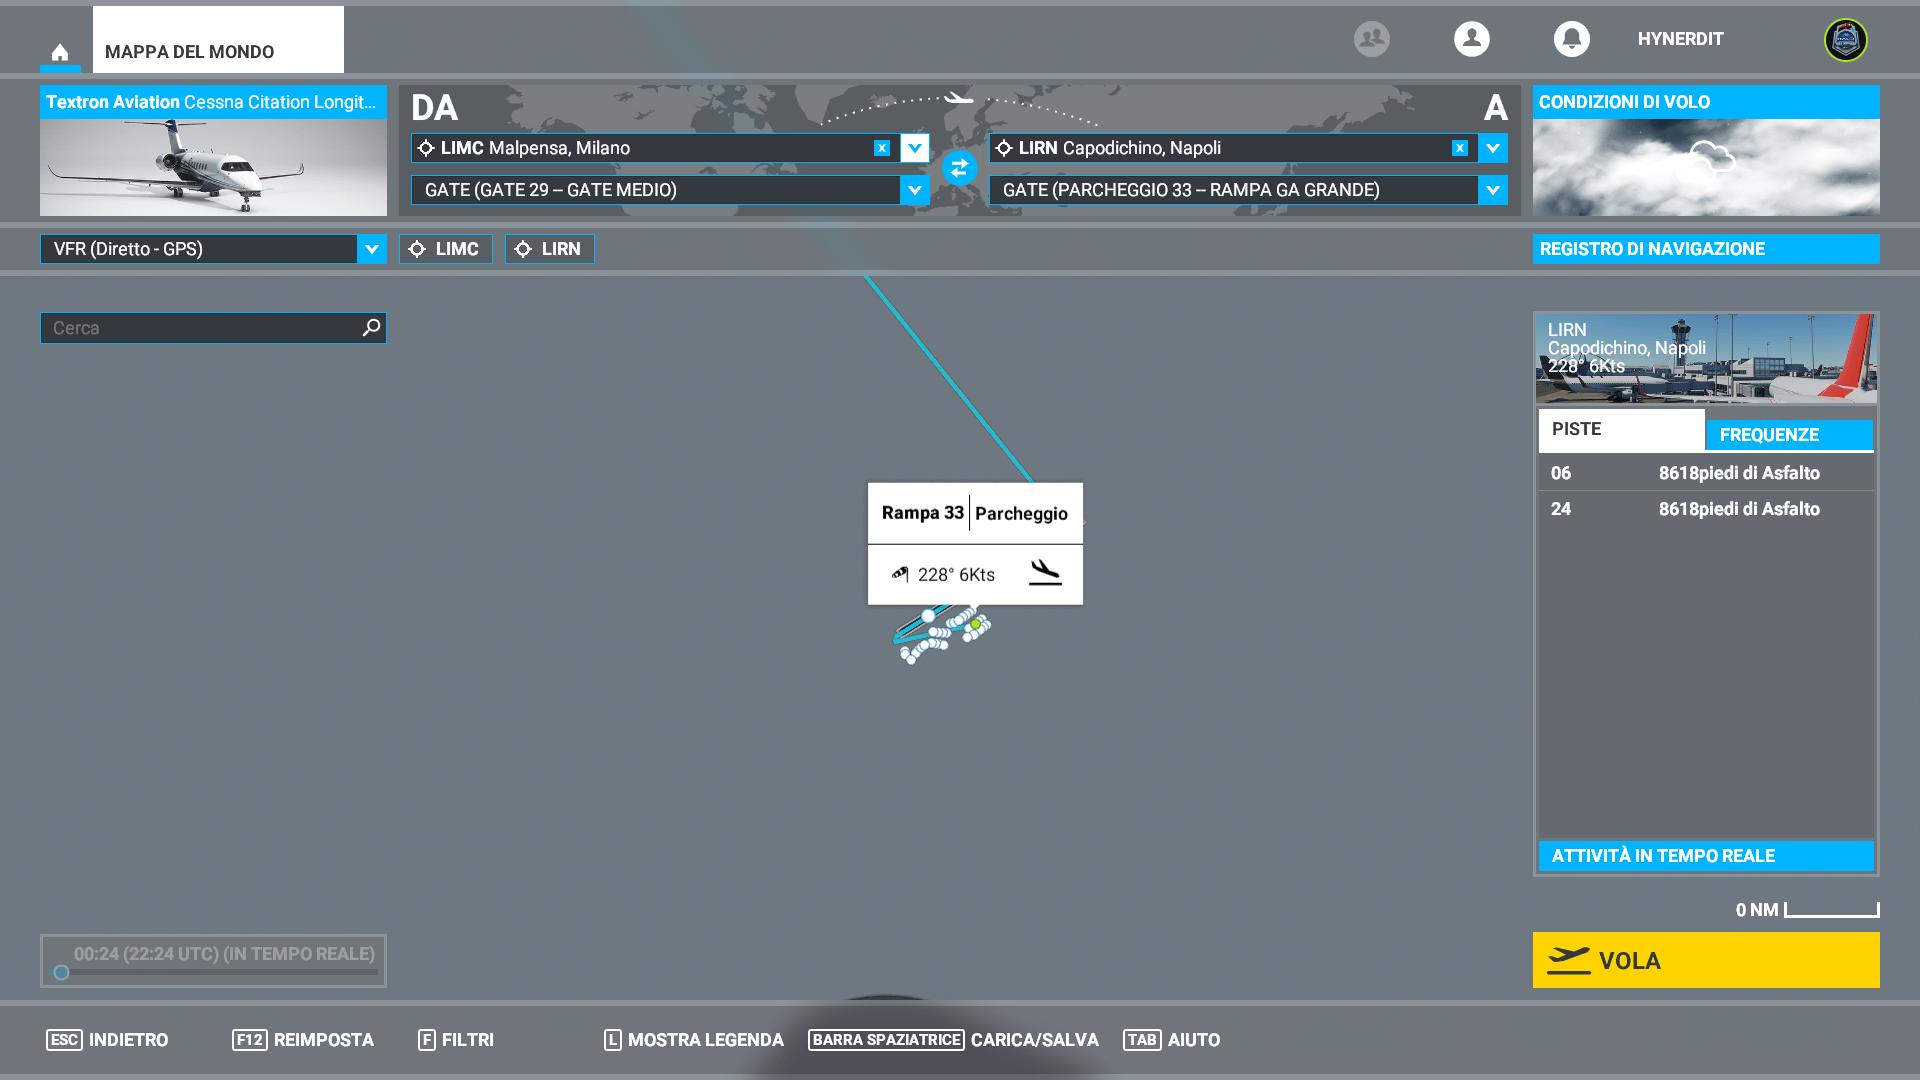 Microsoft Flight Simulator 2020: La Recensione 4 - Hynerd.it